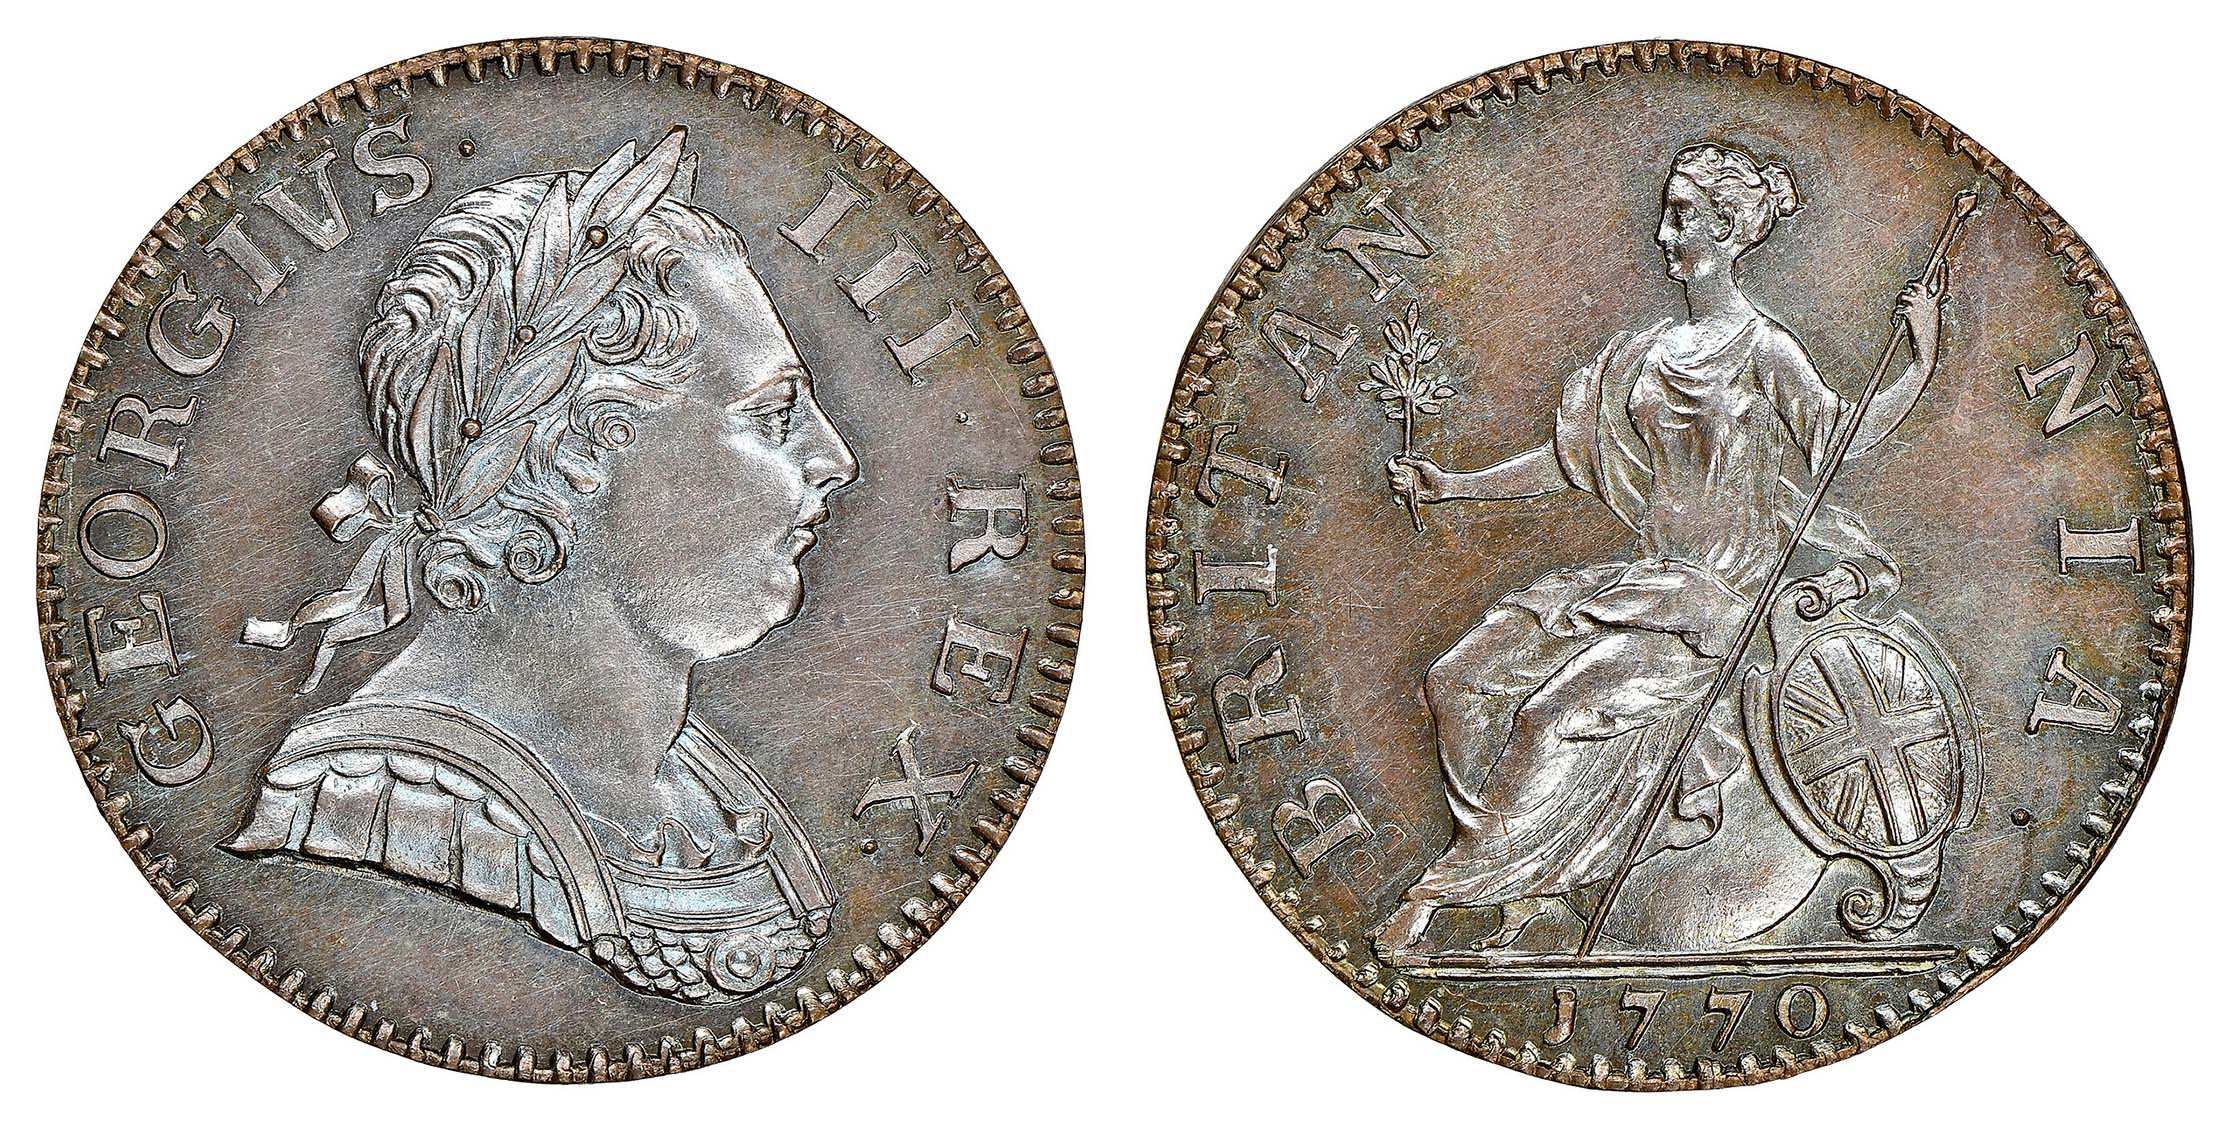 George III (1760-1820). Proof Halfpenny, 1770, PF 64